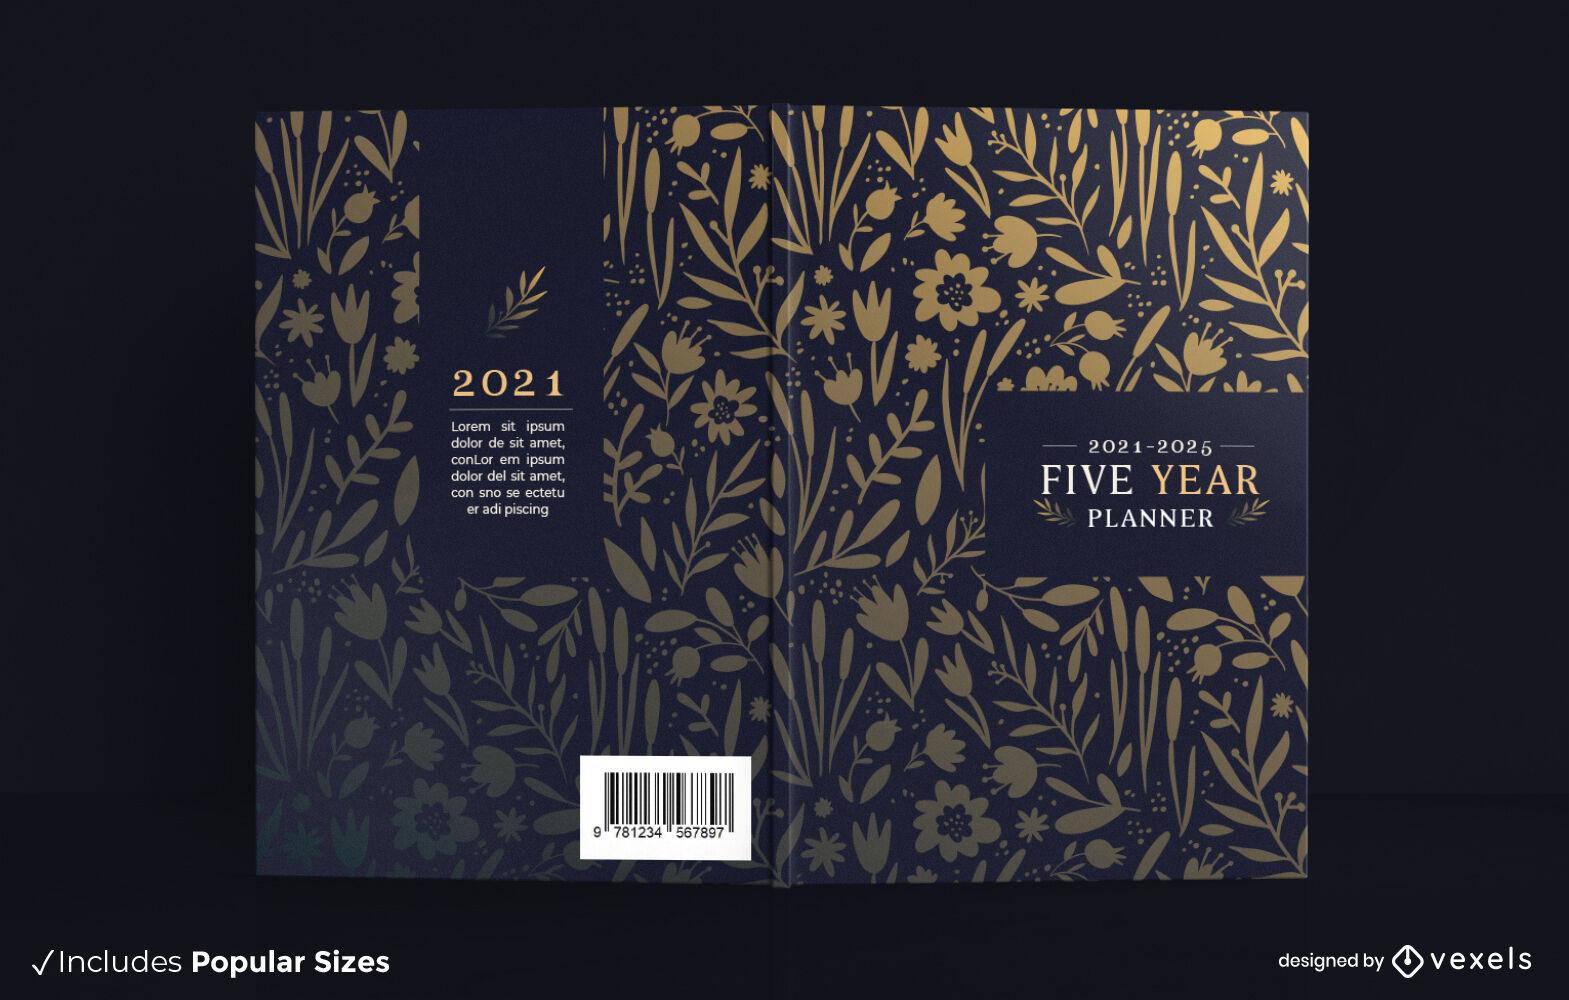 Diseño de portada de libro de planificador de flores doradas